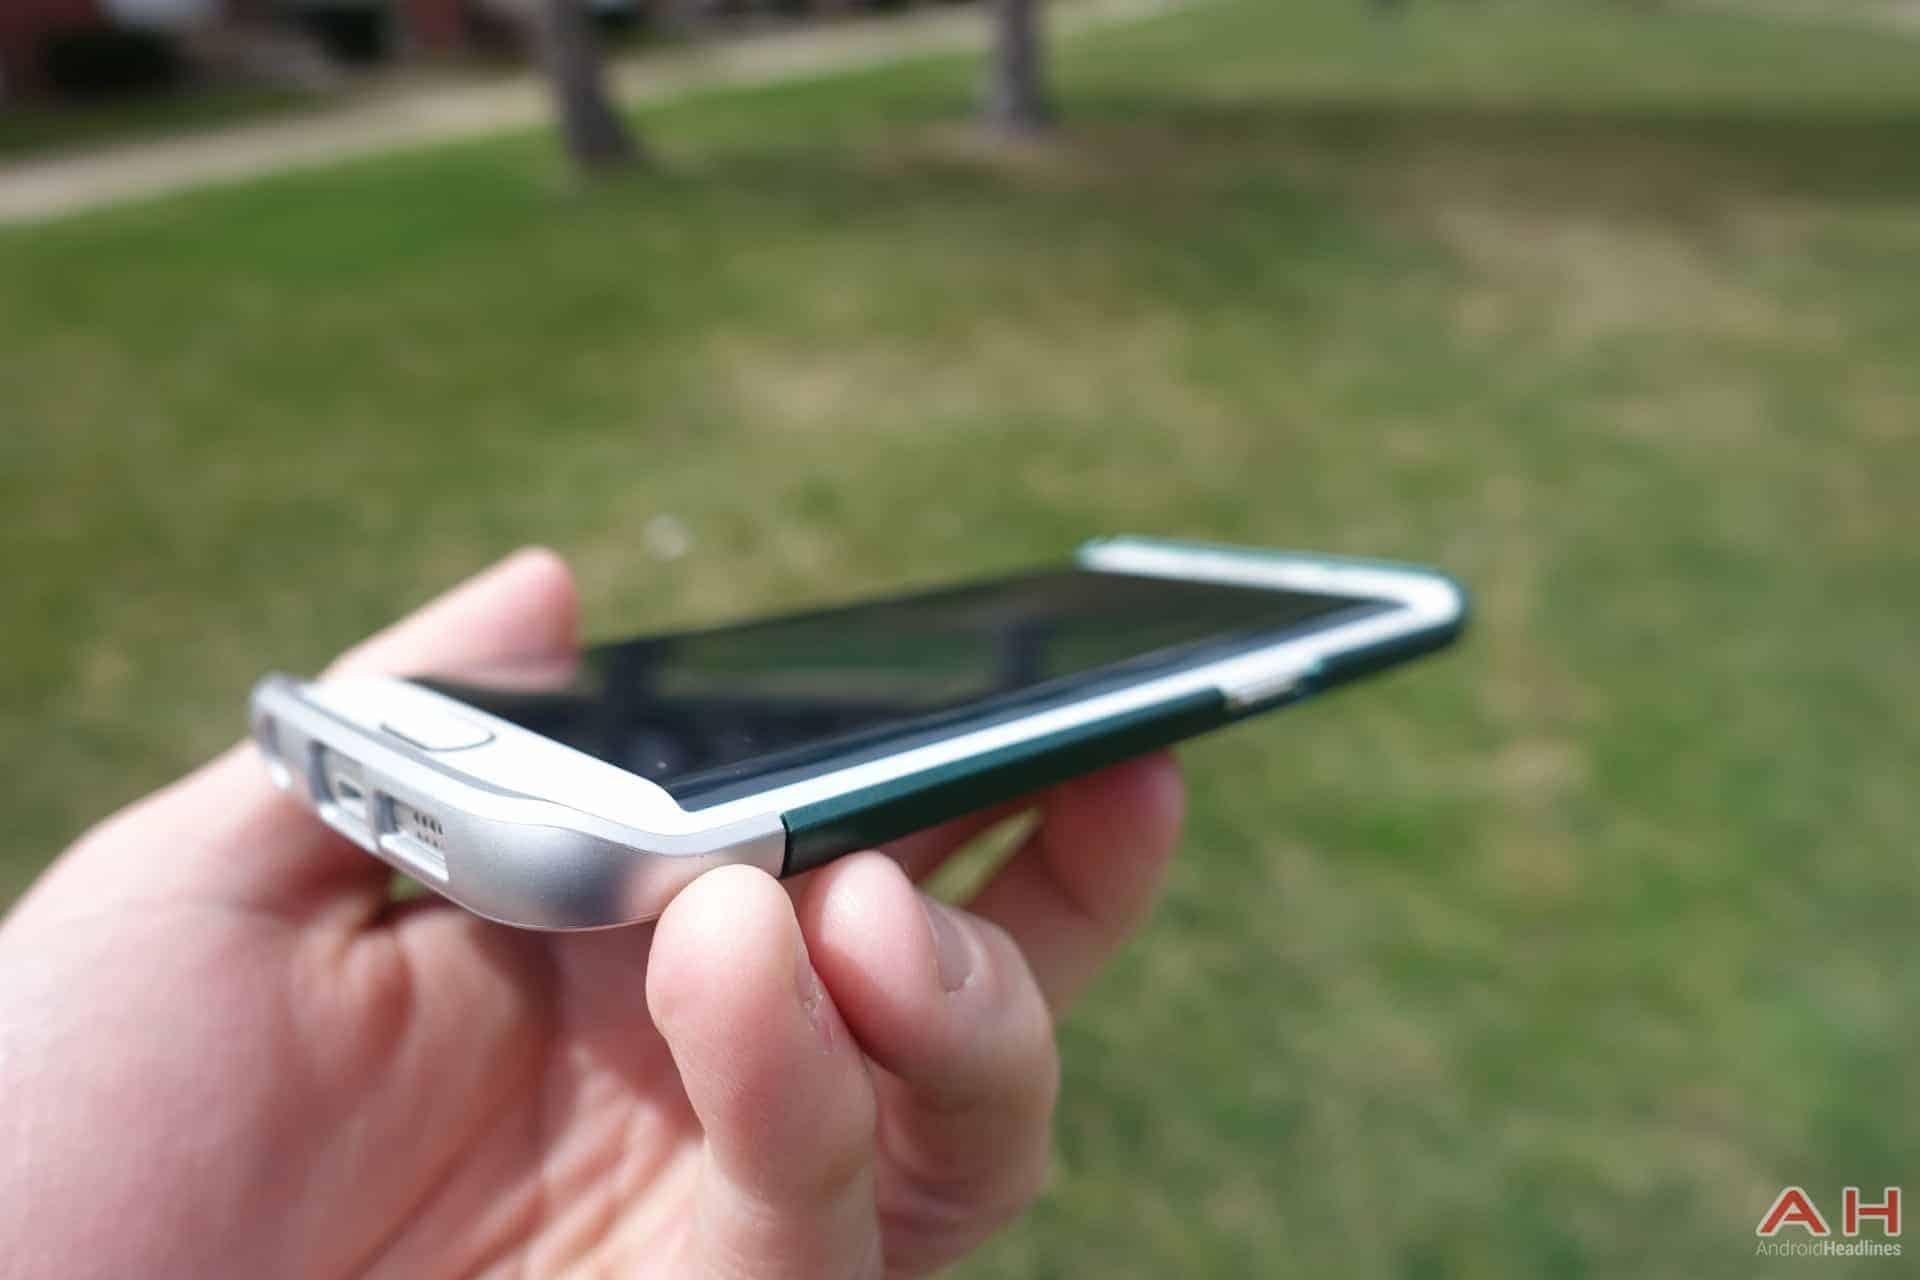 Verus 2 link Galaxy S6 Edge AH 3